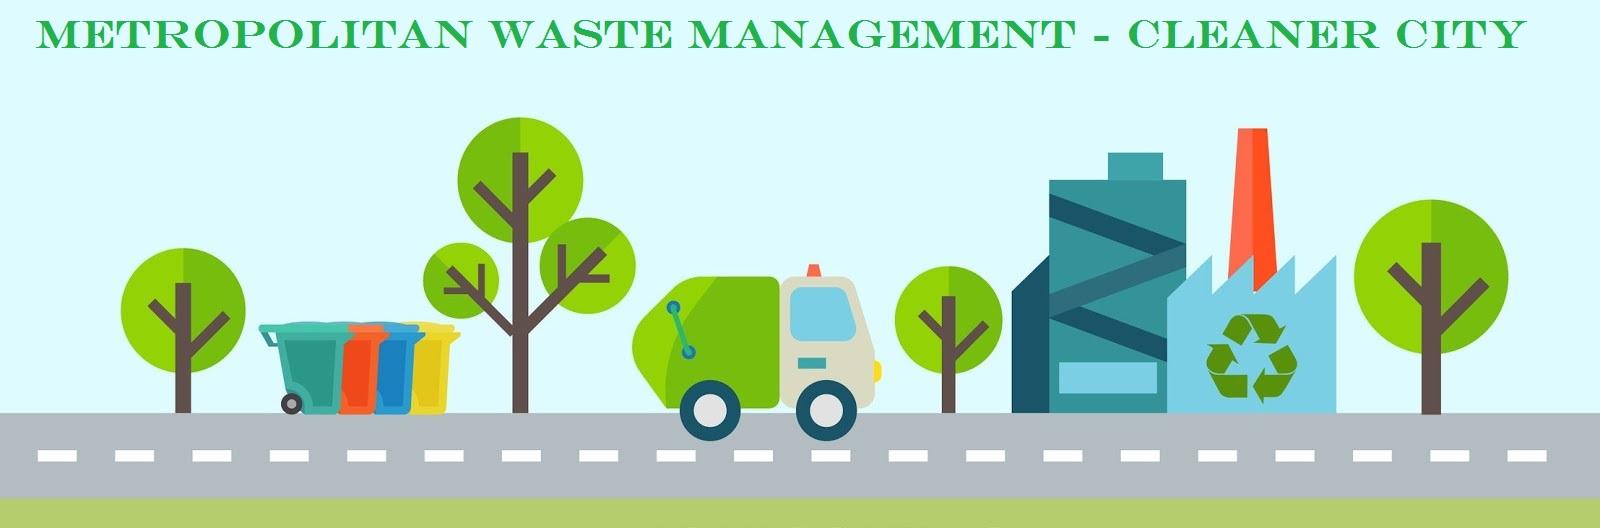 Metropolitan Waste Management - Cleaner City